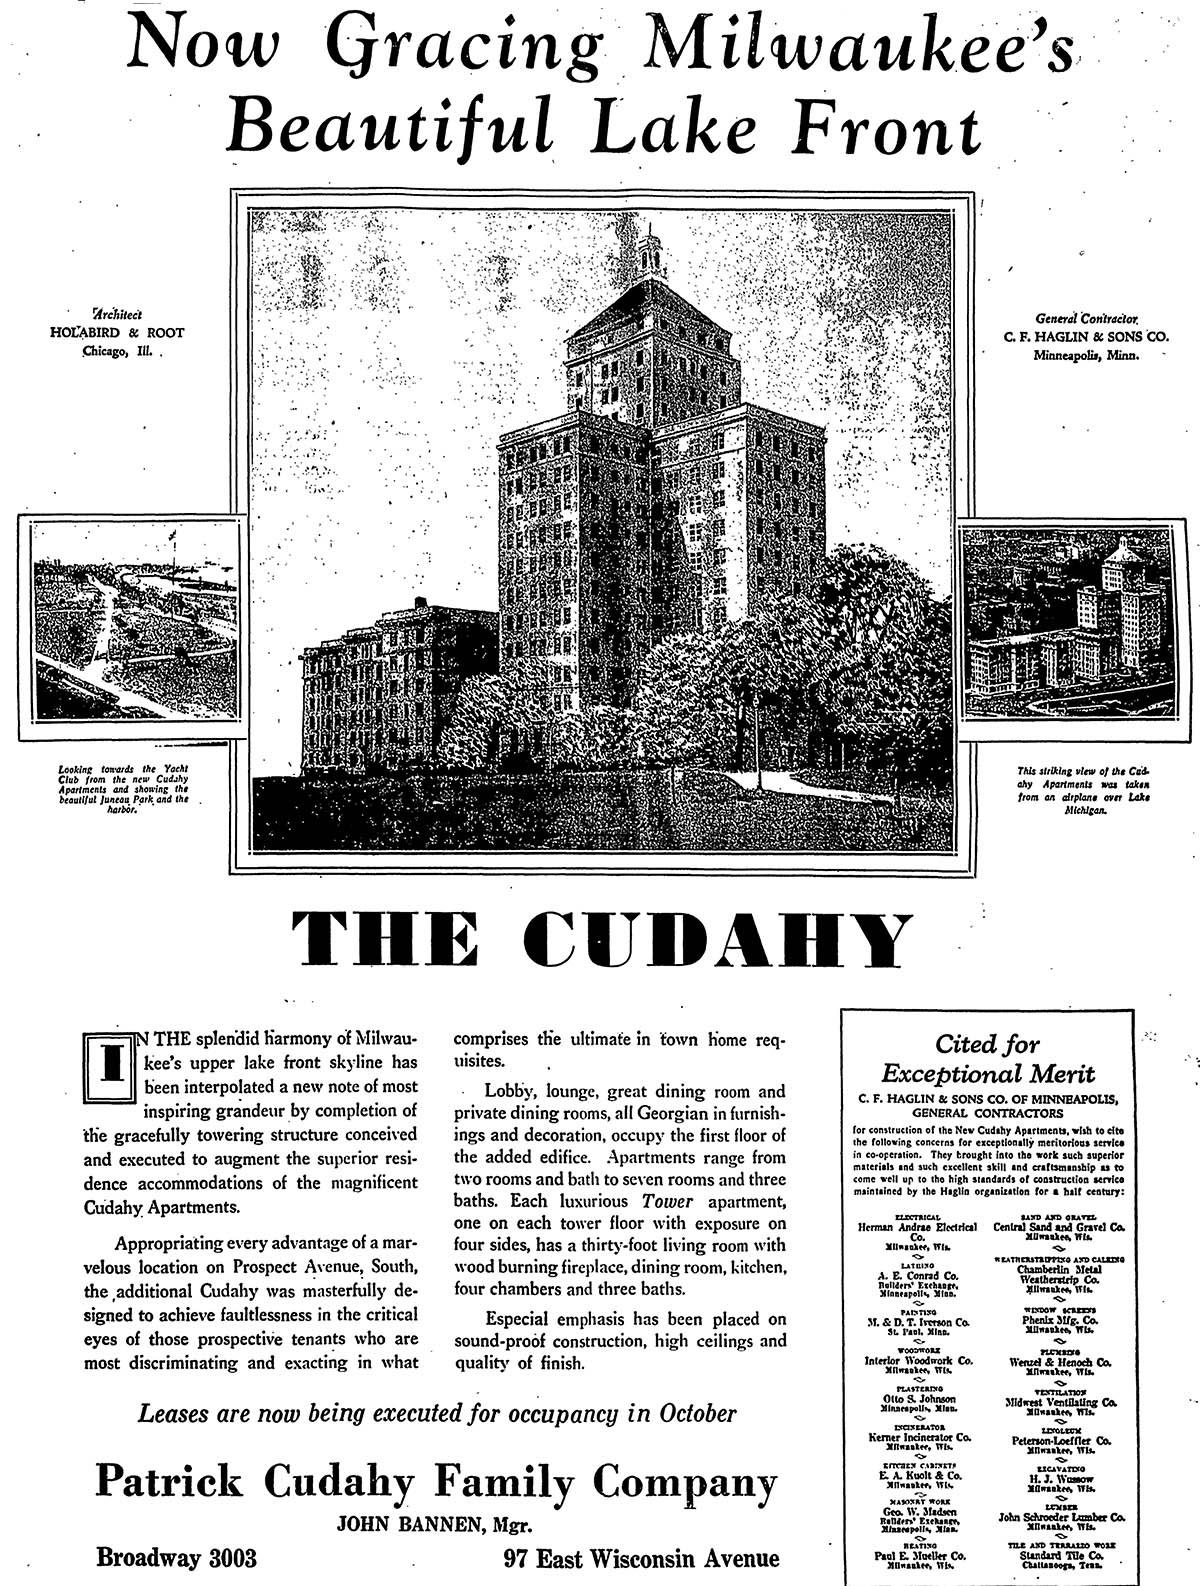 Cudahy Tower